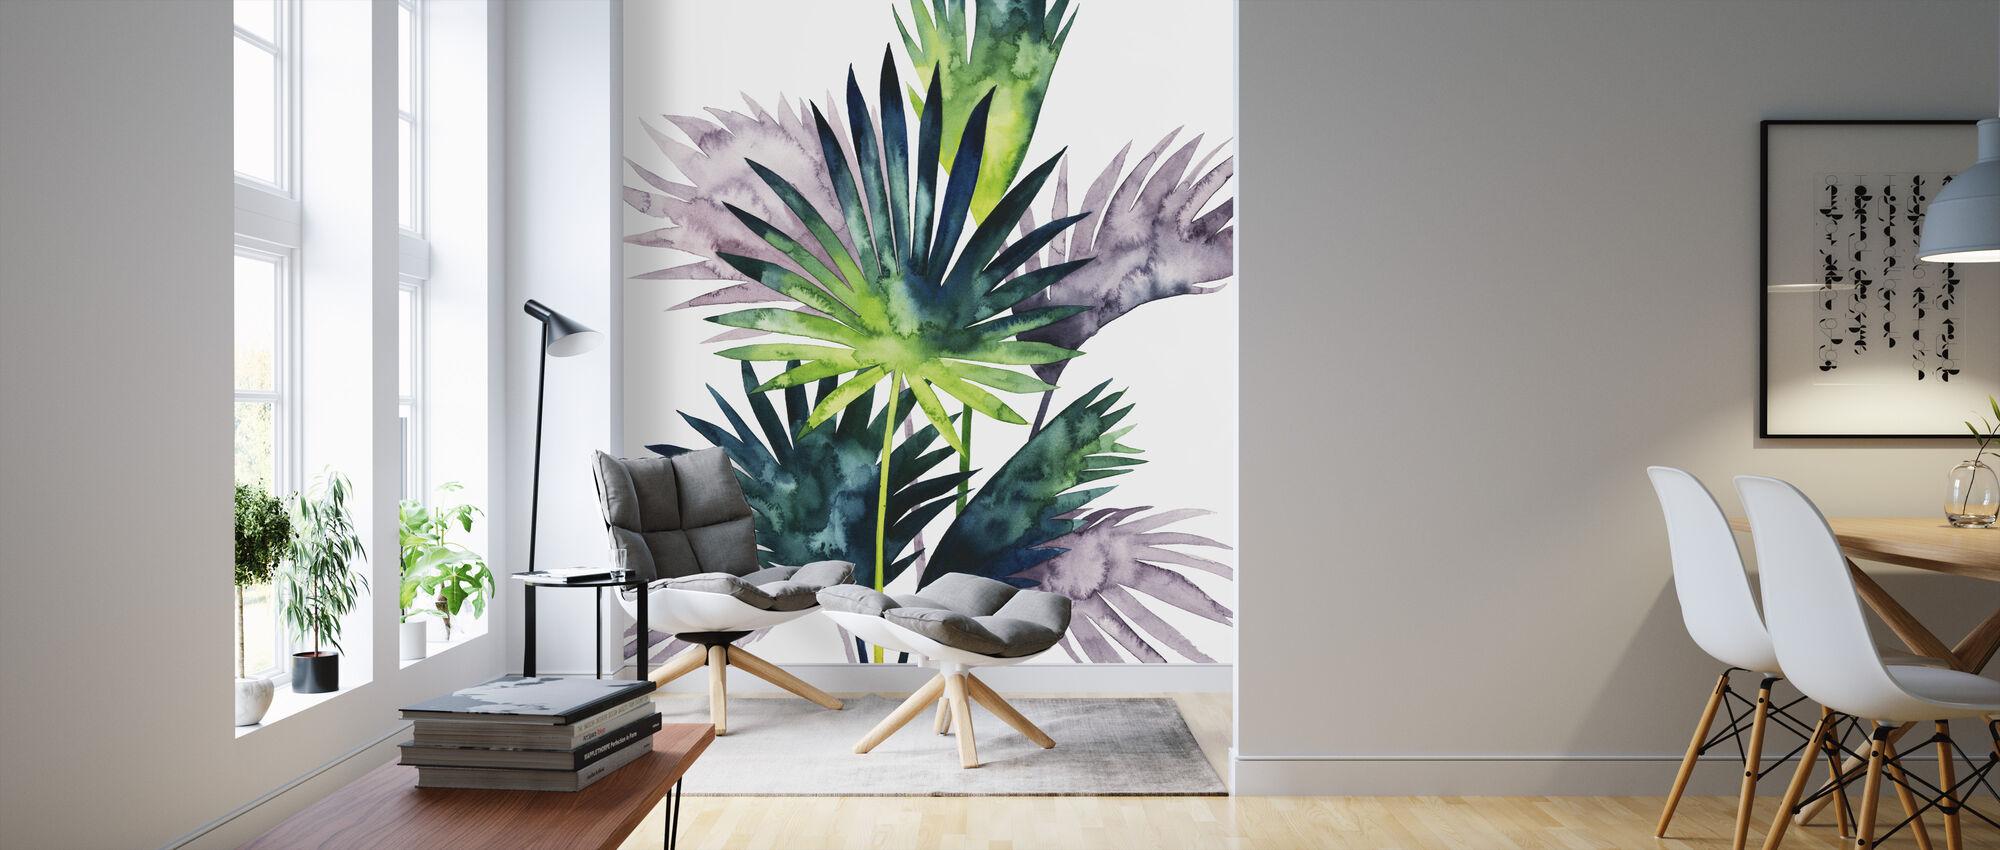 Twilight Palms III - Papel pintado - Salón